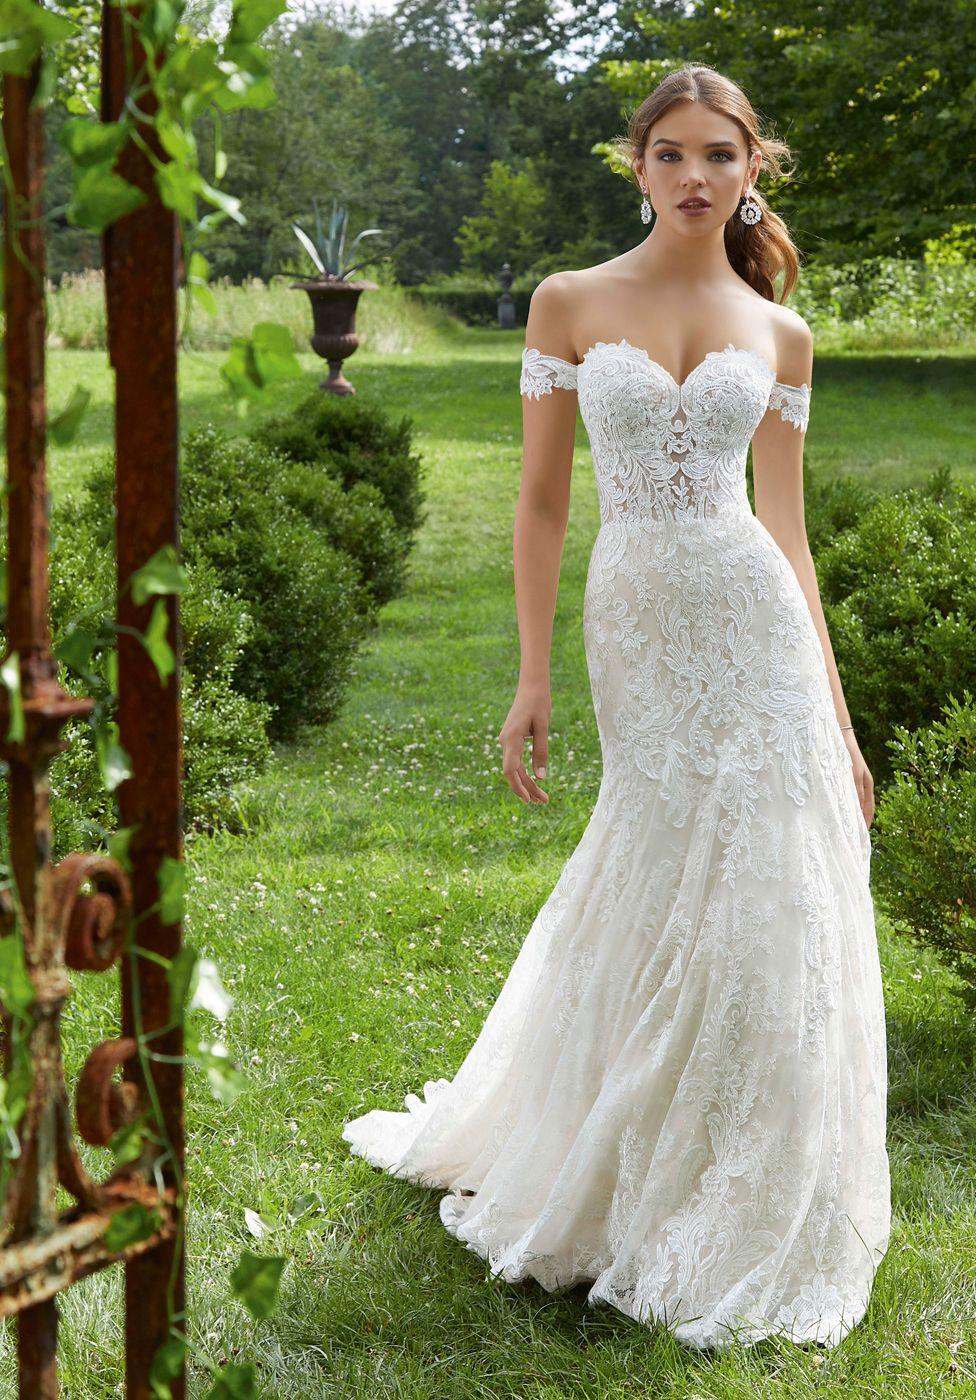 Mori Lee 5714 Paradisa Sweetheart Neckline Bridal Dress Lace Mermaid Wedding Dress Fit And Flare Wedding Dress Wedding Dresses [ 1400 x 976 Pixel ]